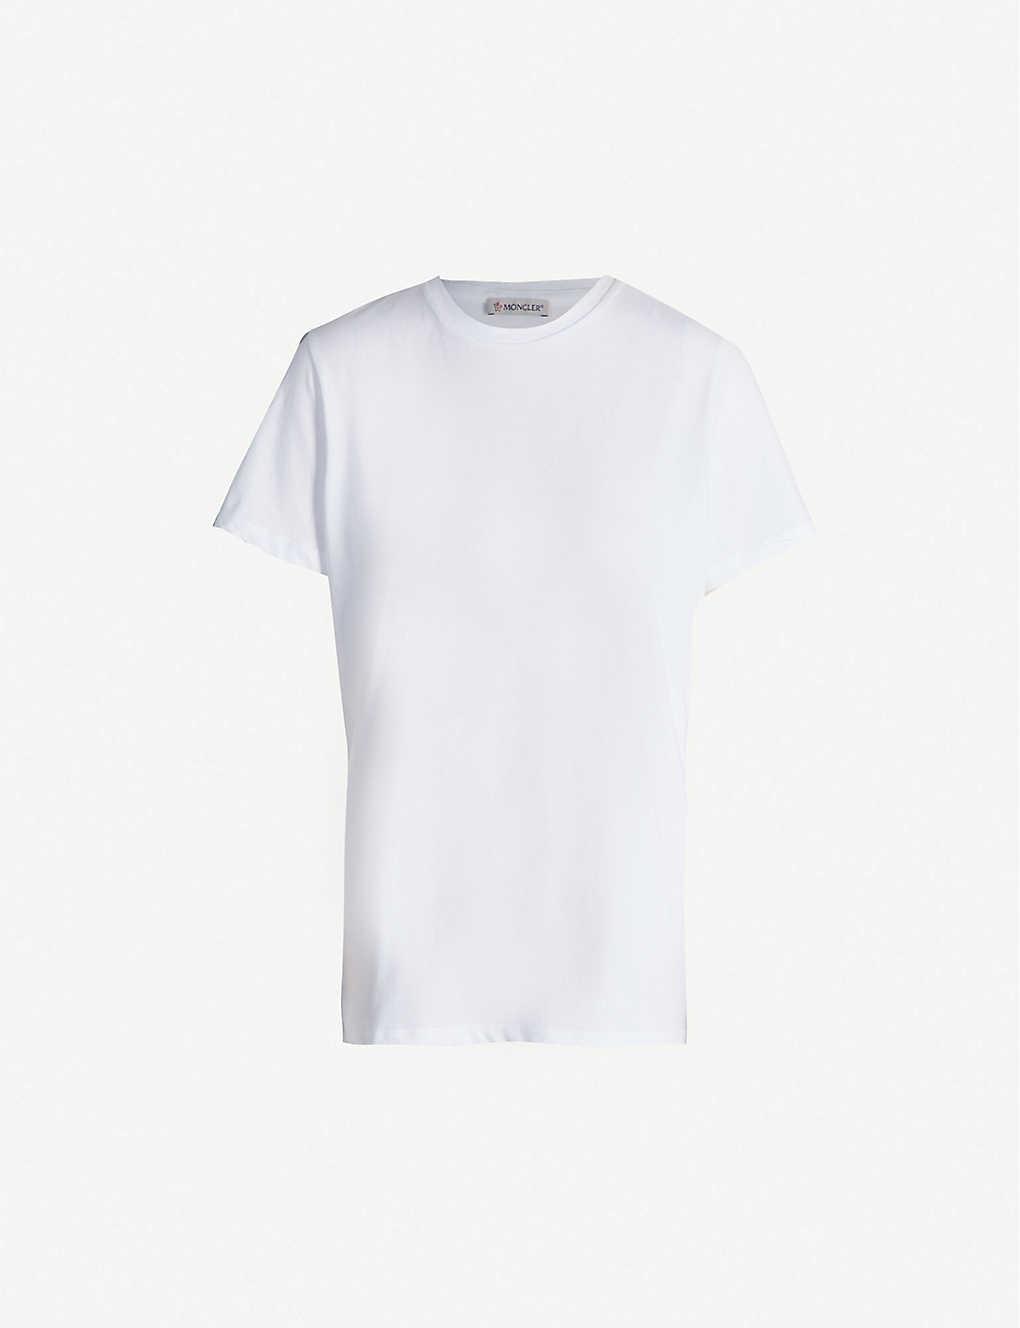 547c10fec Round-neck brand-print cotton-jersey T-shirt